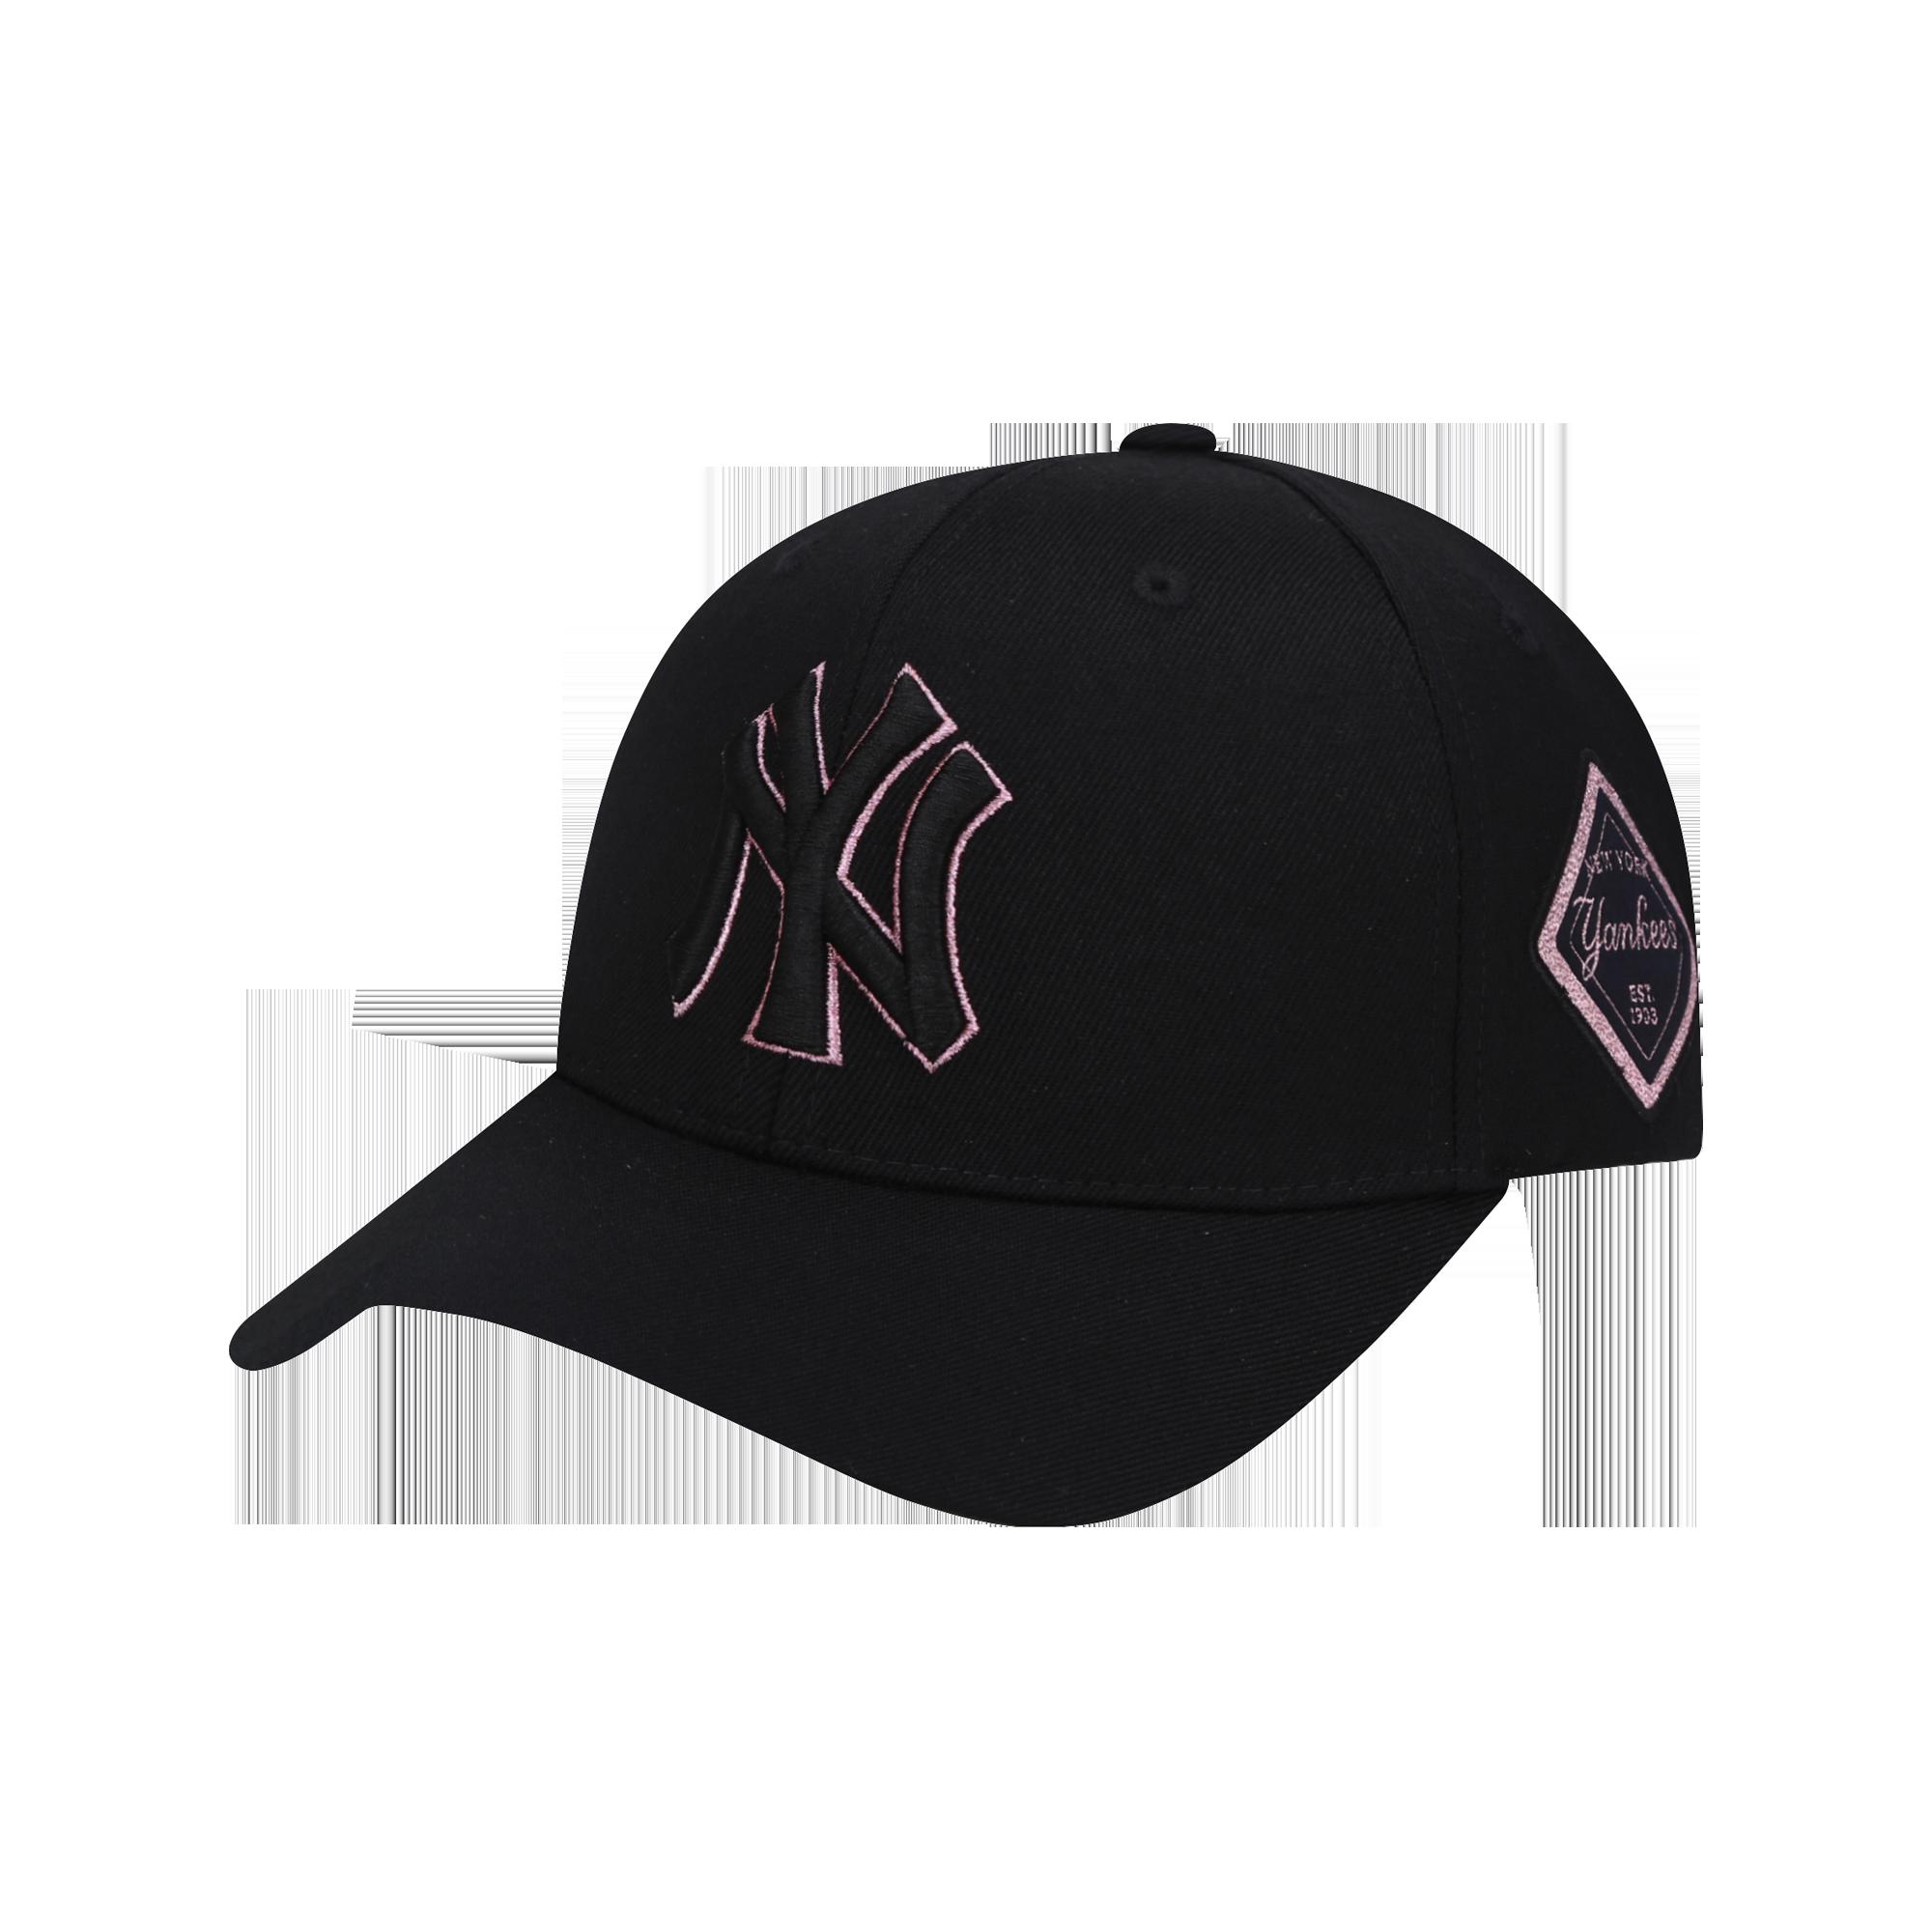 NEW YORK YANKEES DIAMOND ADJUSTABLE CAP